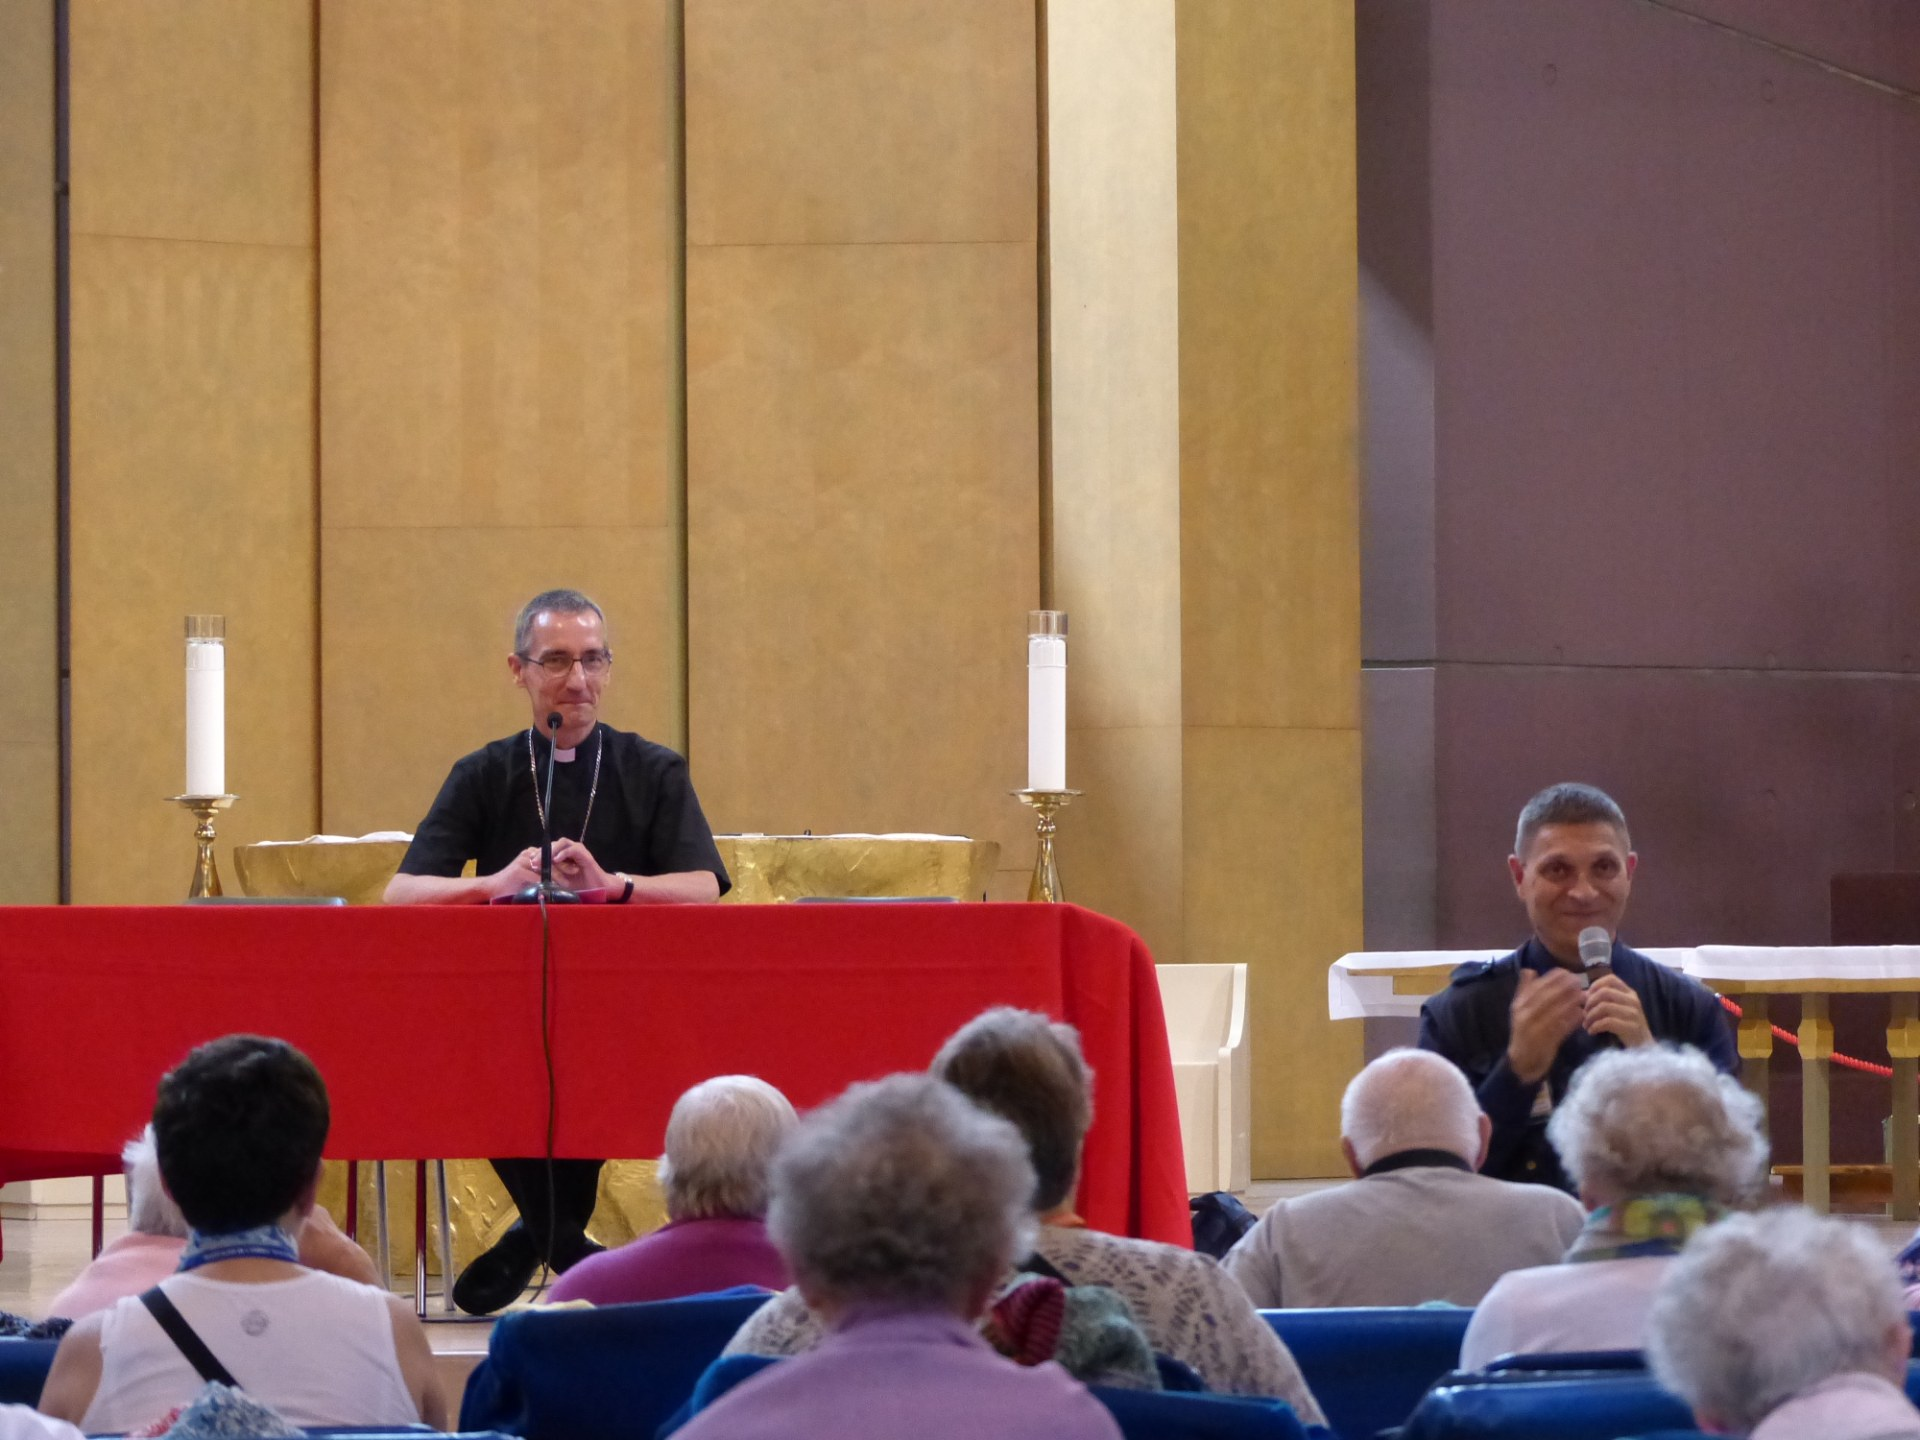 Lourdes2018-photos conference Mgr Dollmann (2)